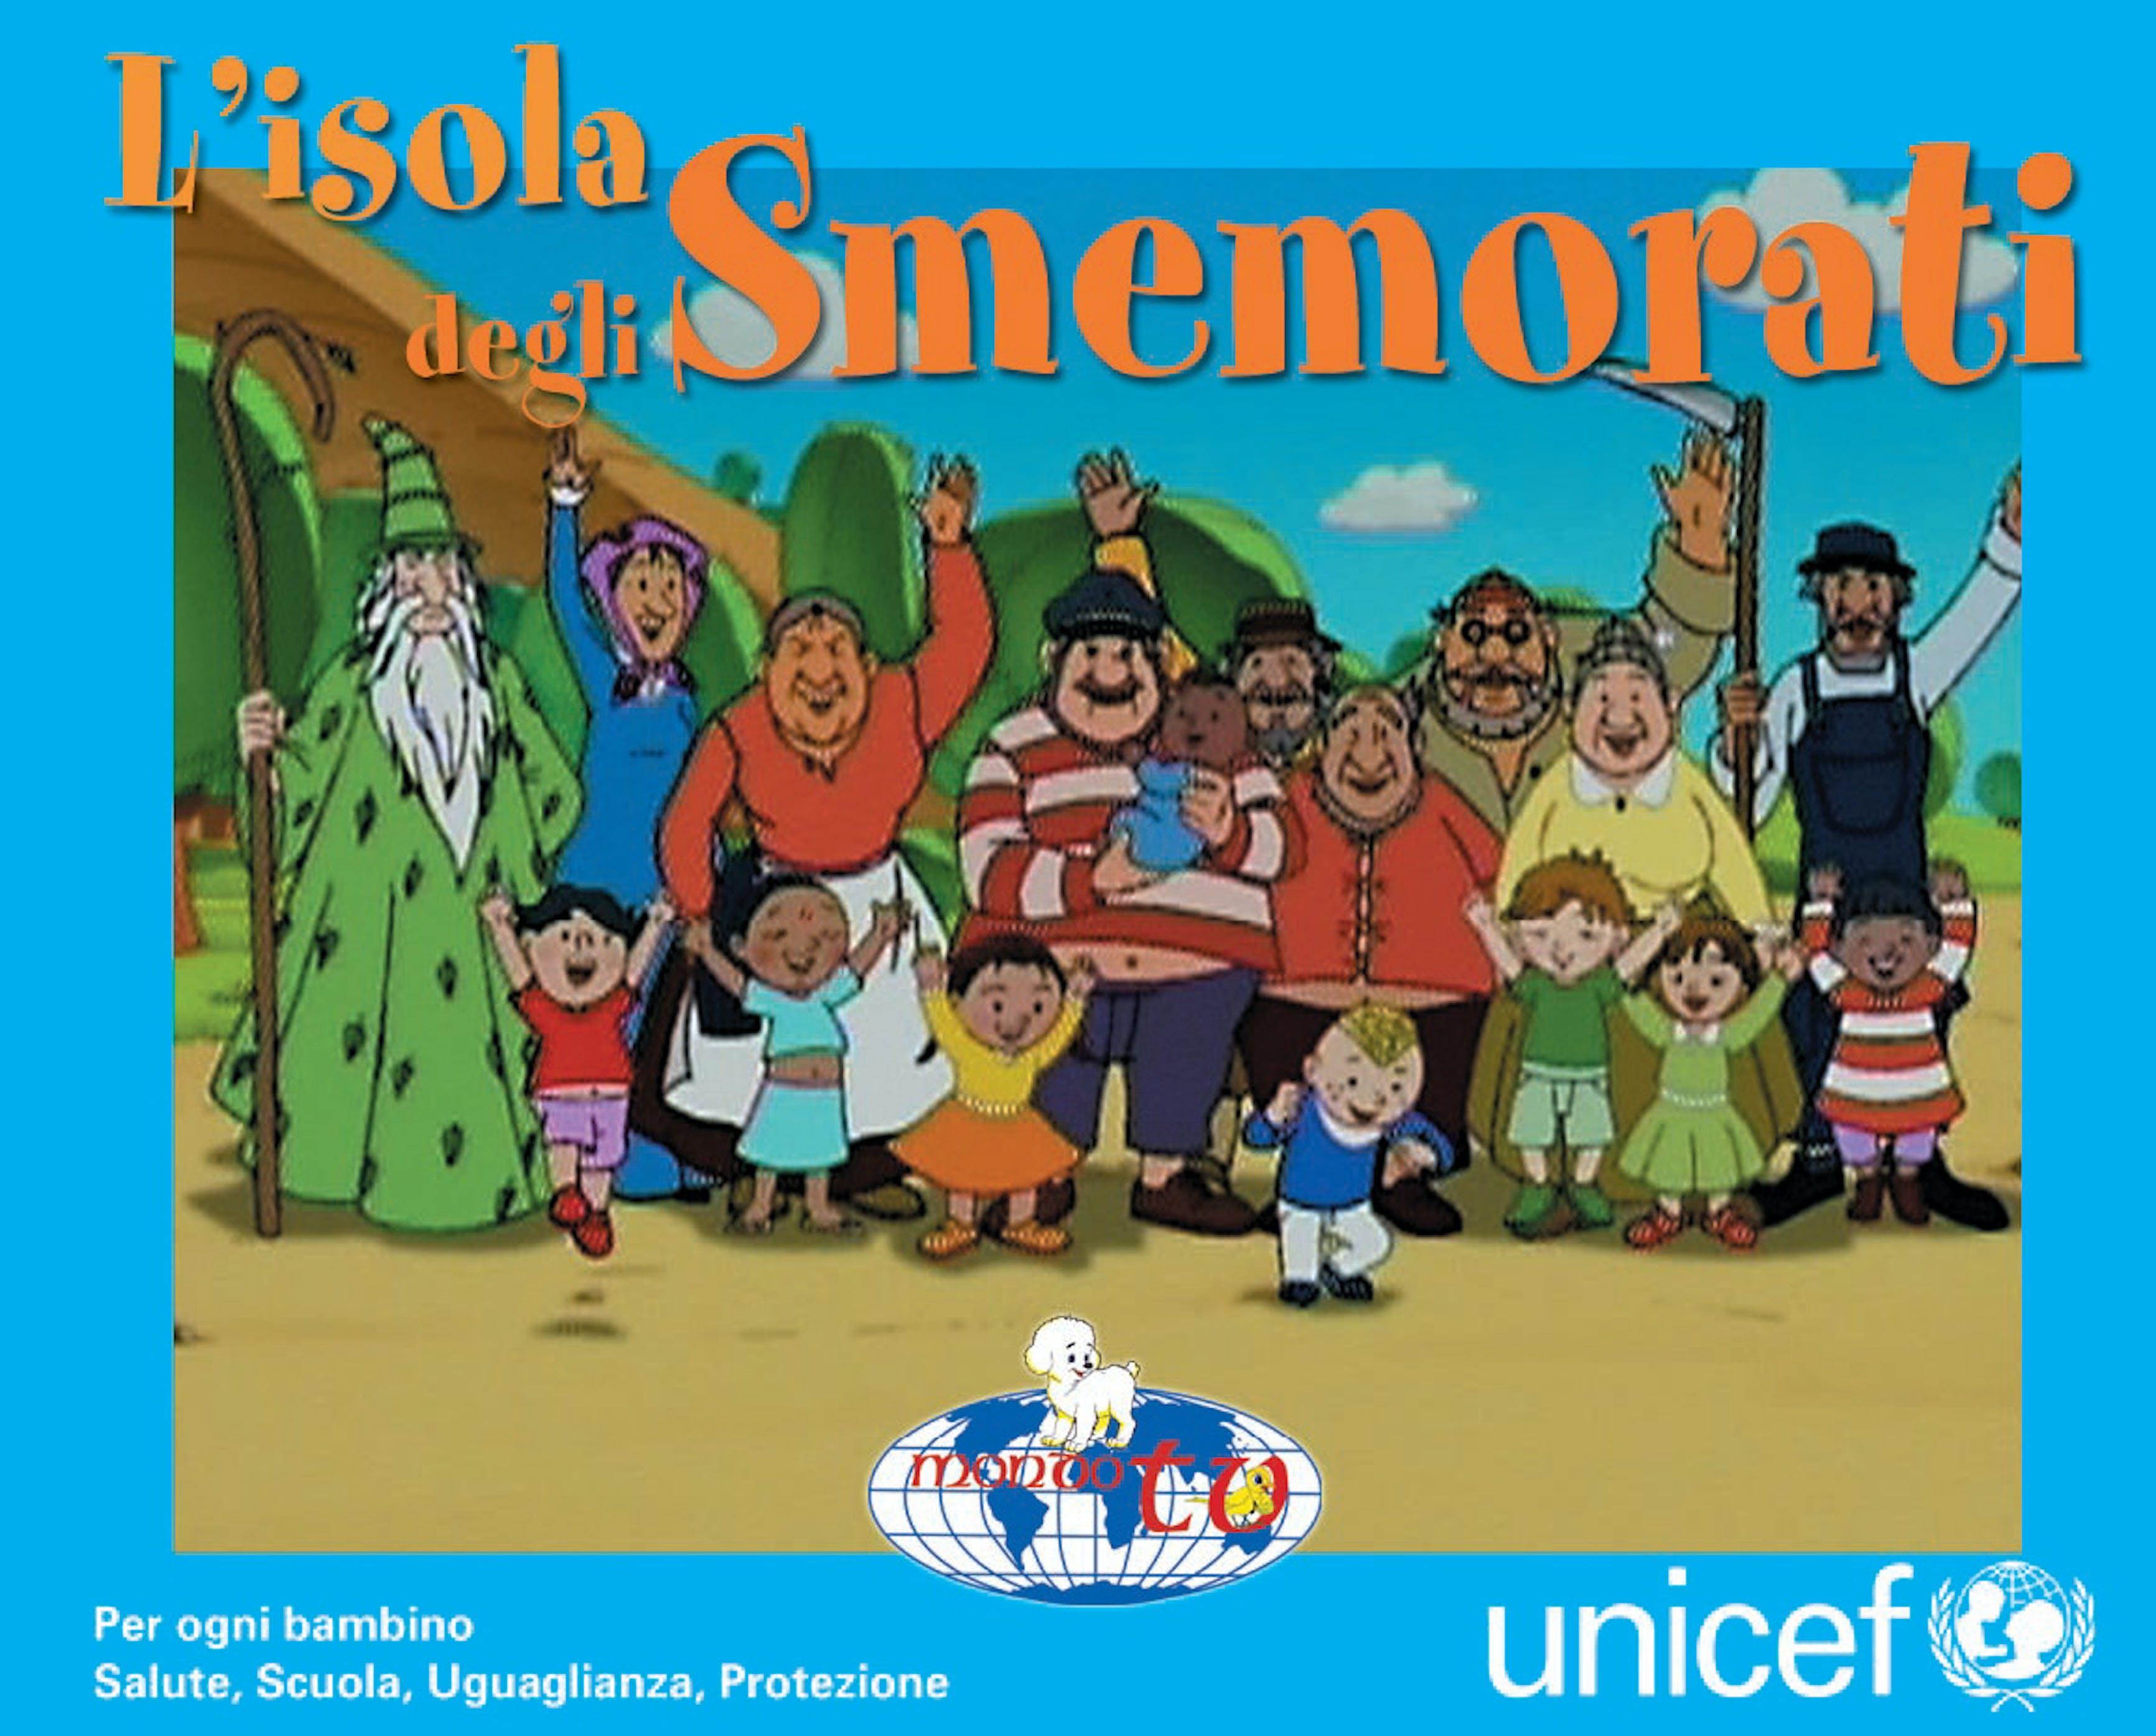 sticker_UNICEF_MONDO_E.jpg